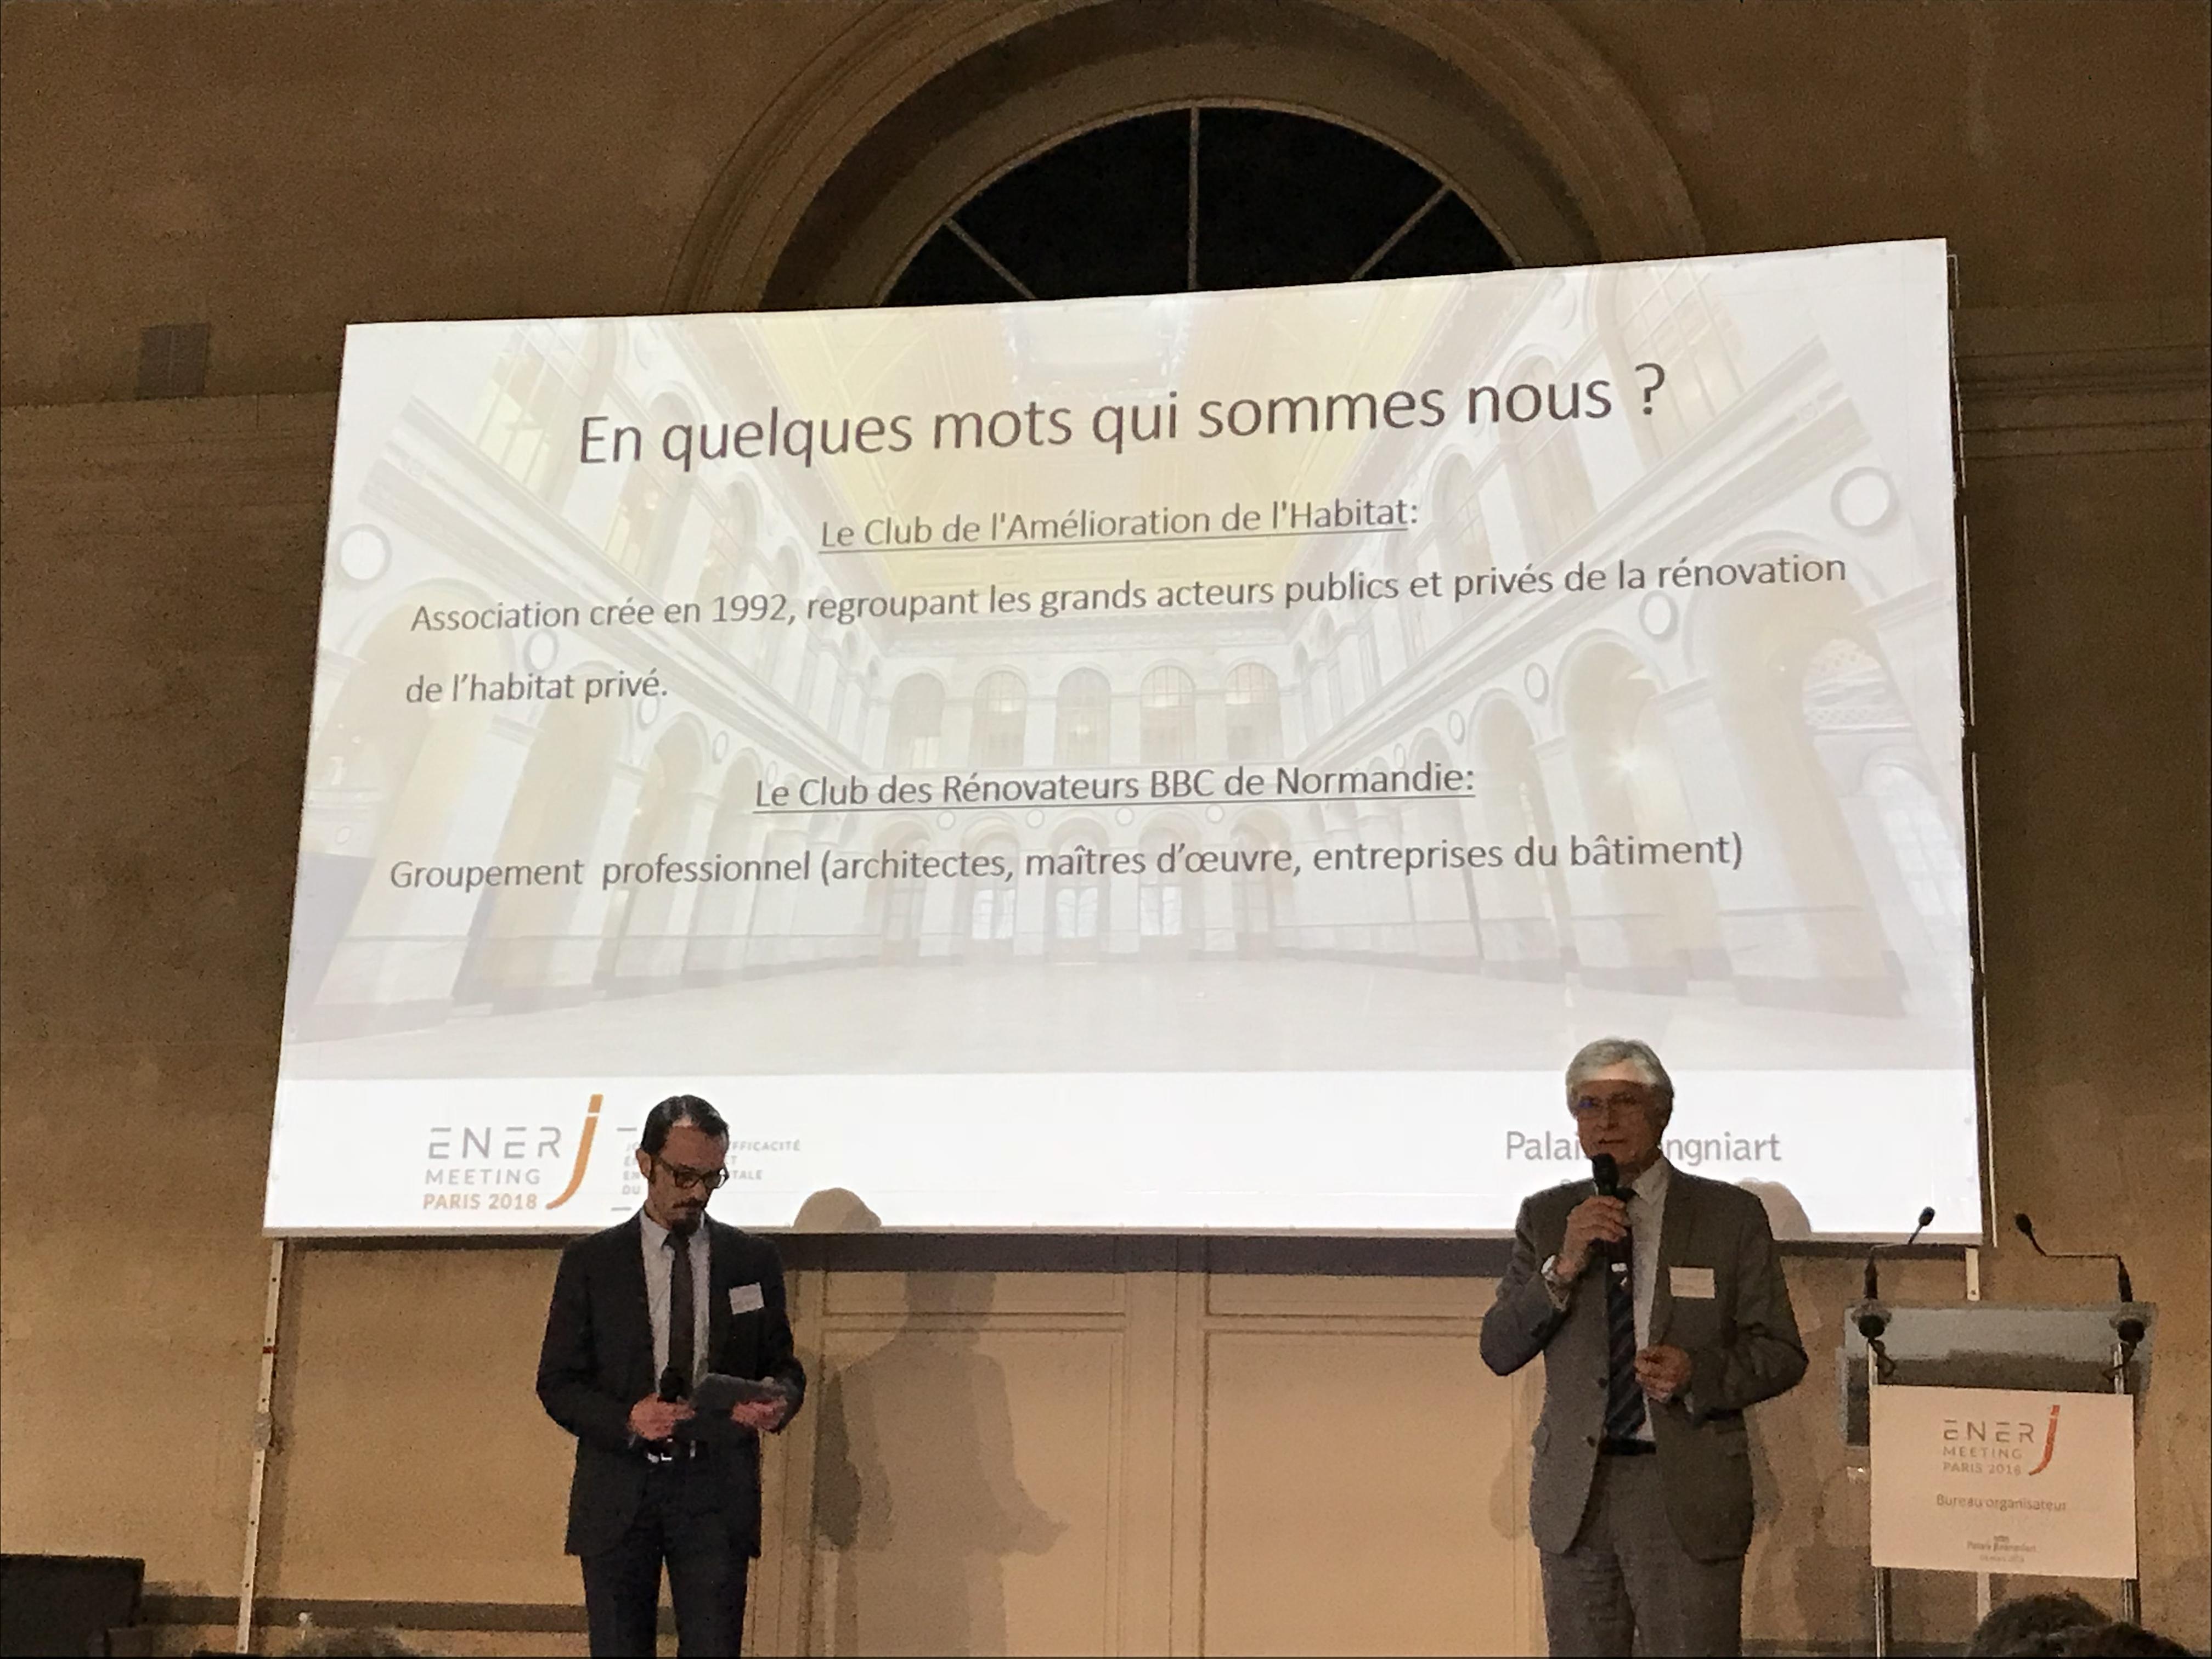 Ener-J Meeting - Jeudi 8 mars 2018 - Palais Brongniart